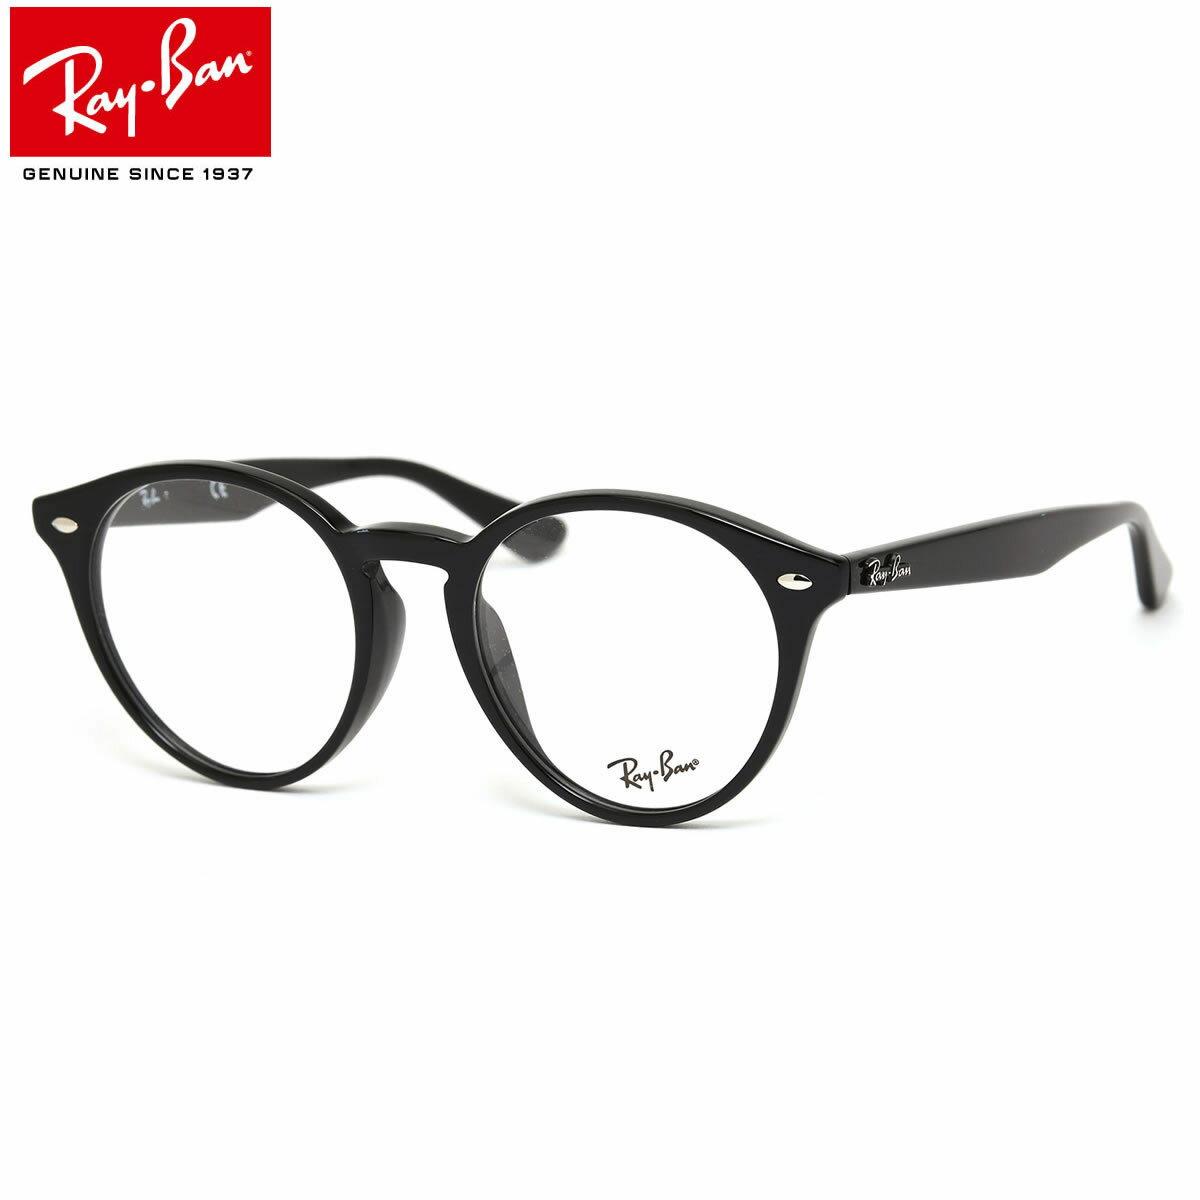 Ray Ban Round Glasses Frames « Heritage Malta